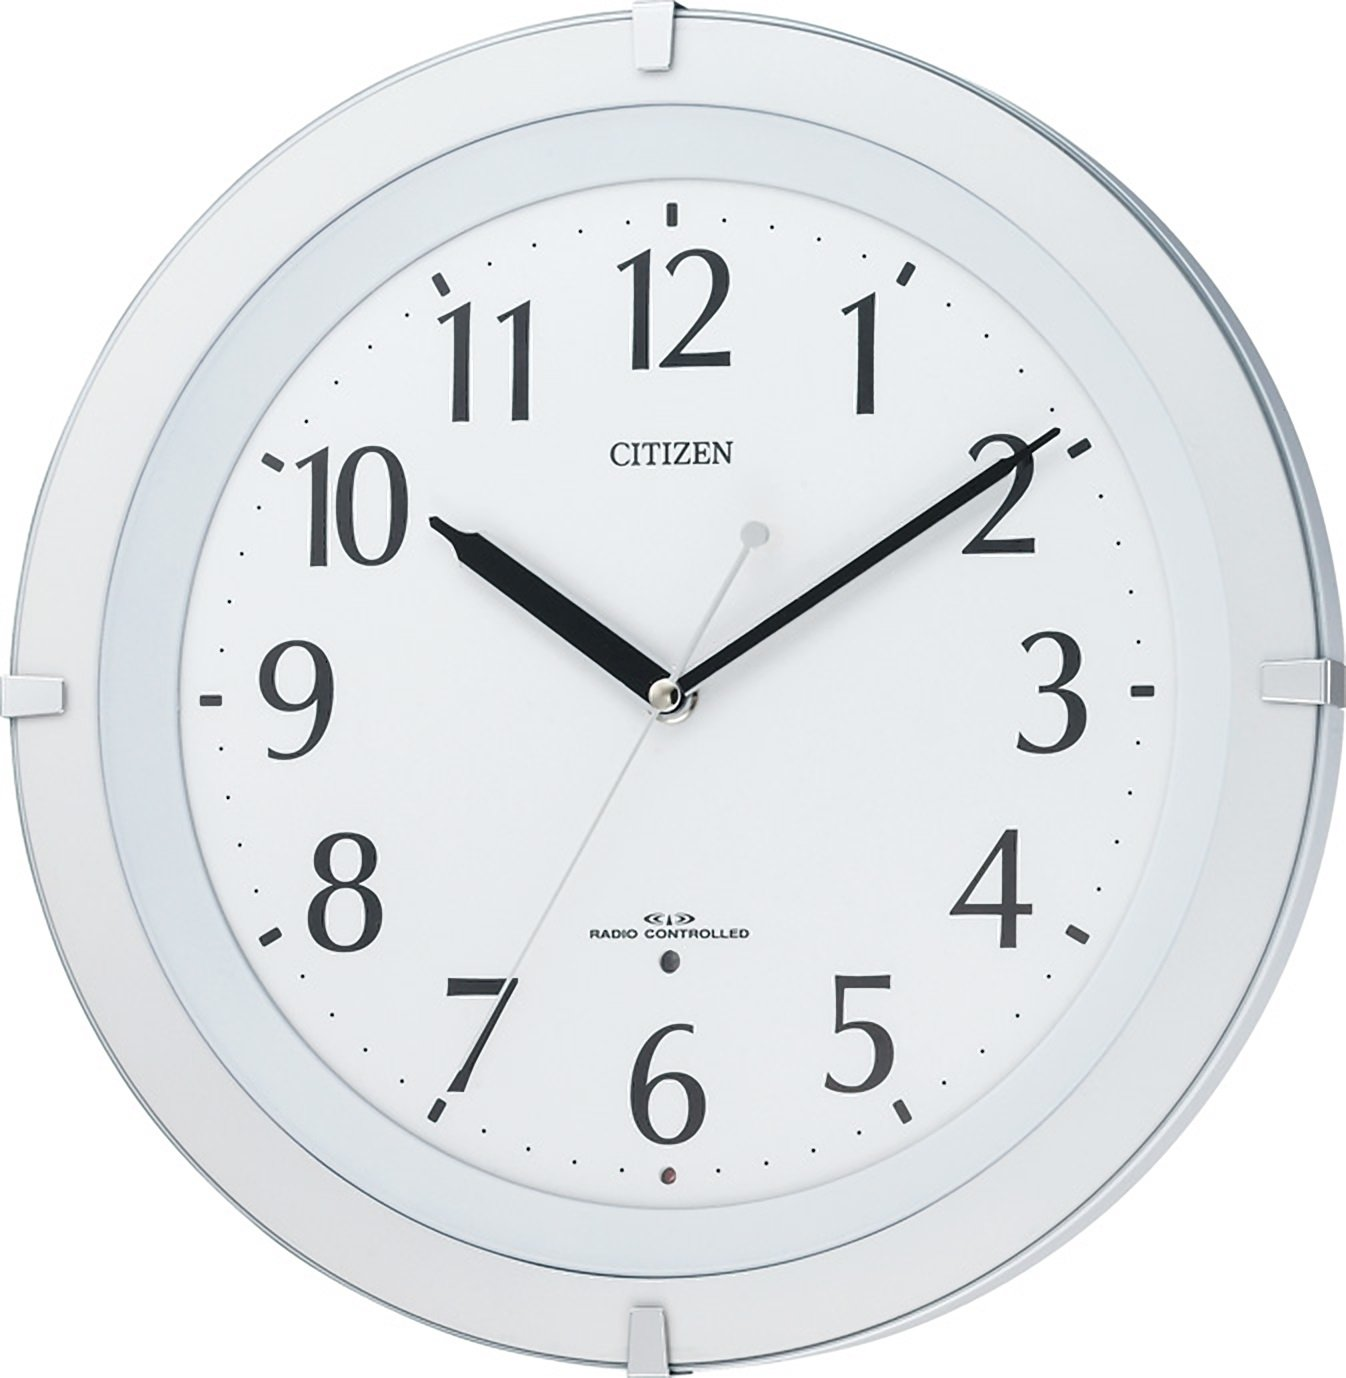 CITIZEN ( シチズン ) 電波 掛け時計 リバライト F460 ホワイト 8MY460-003 B003R50KRIホワイト